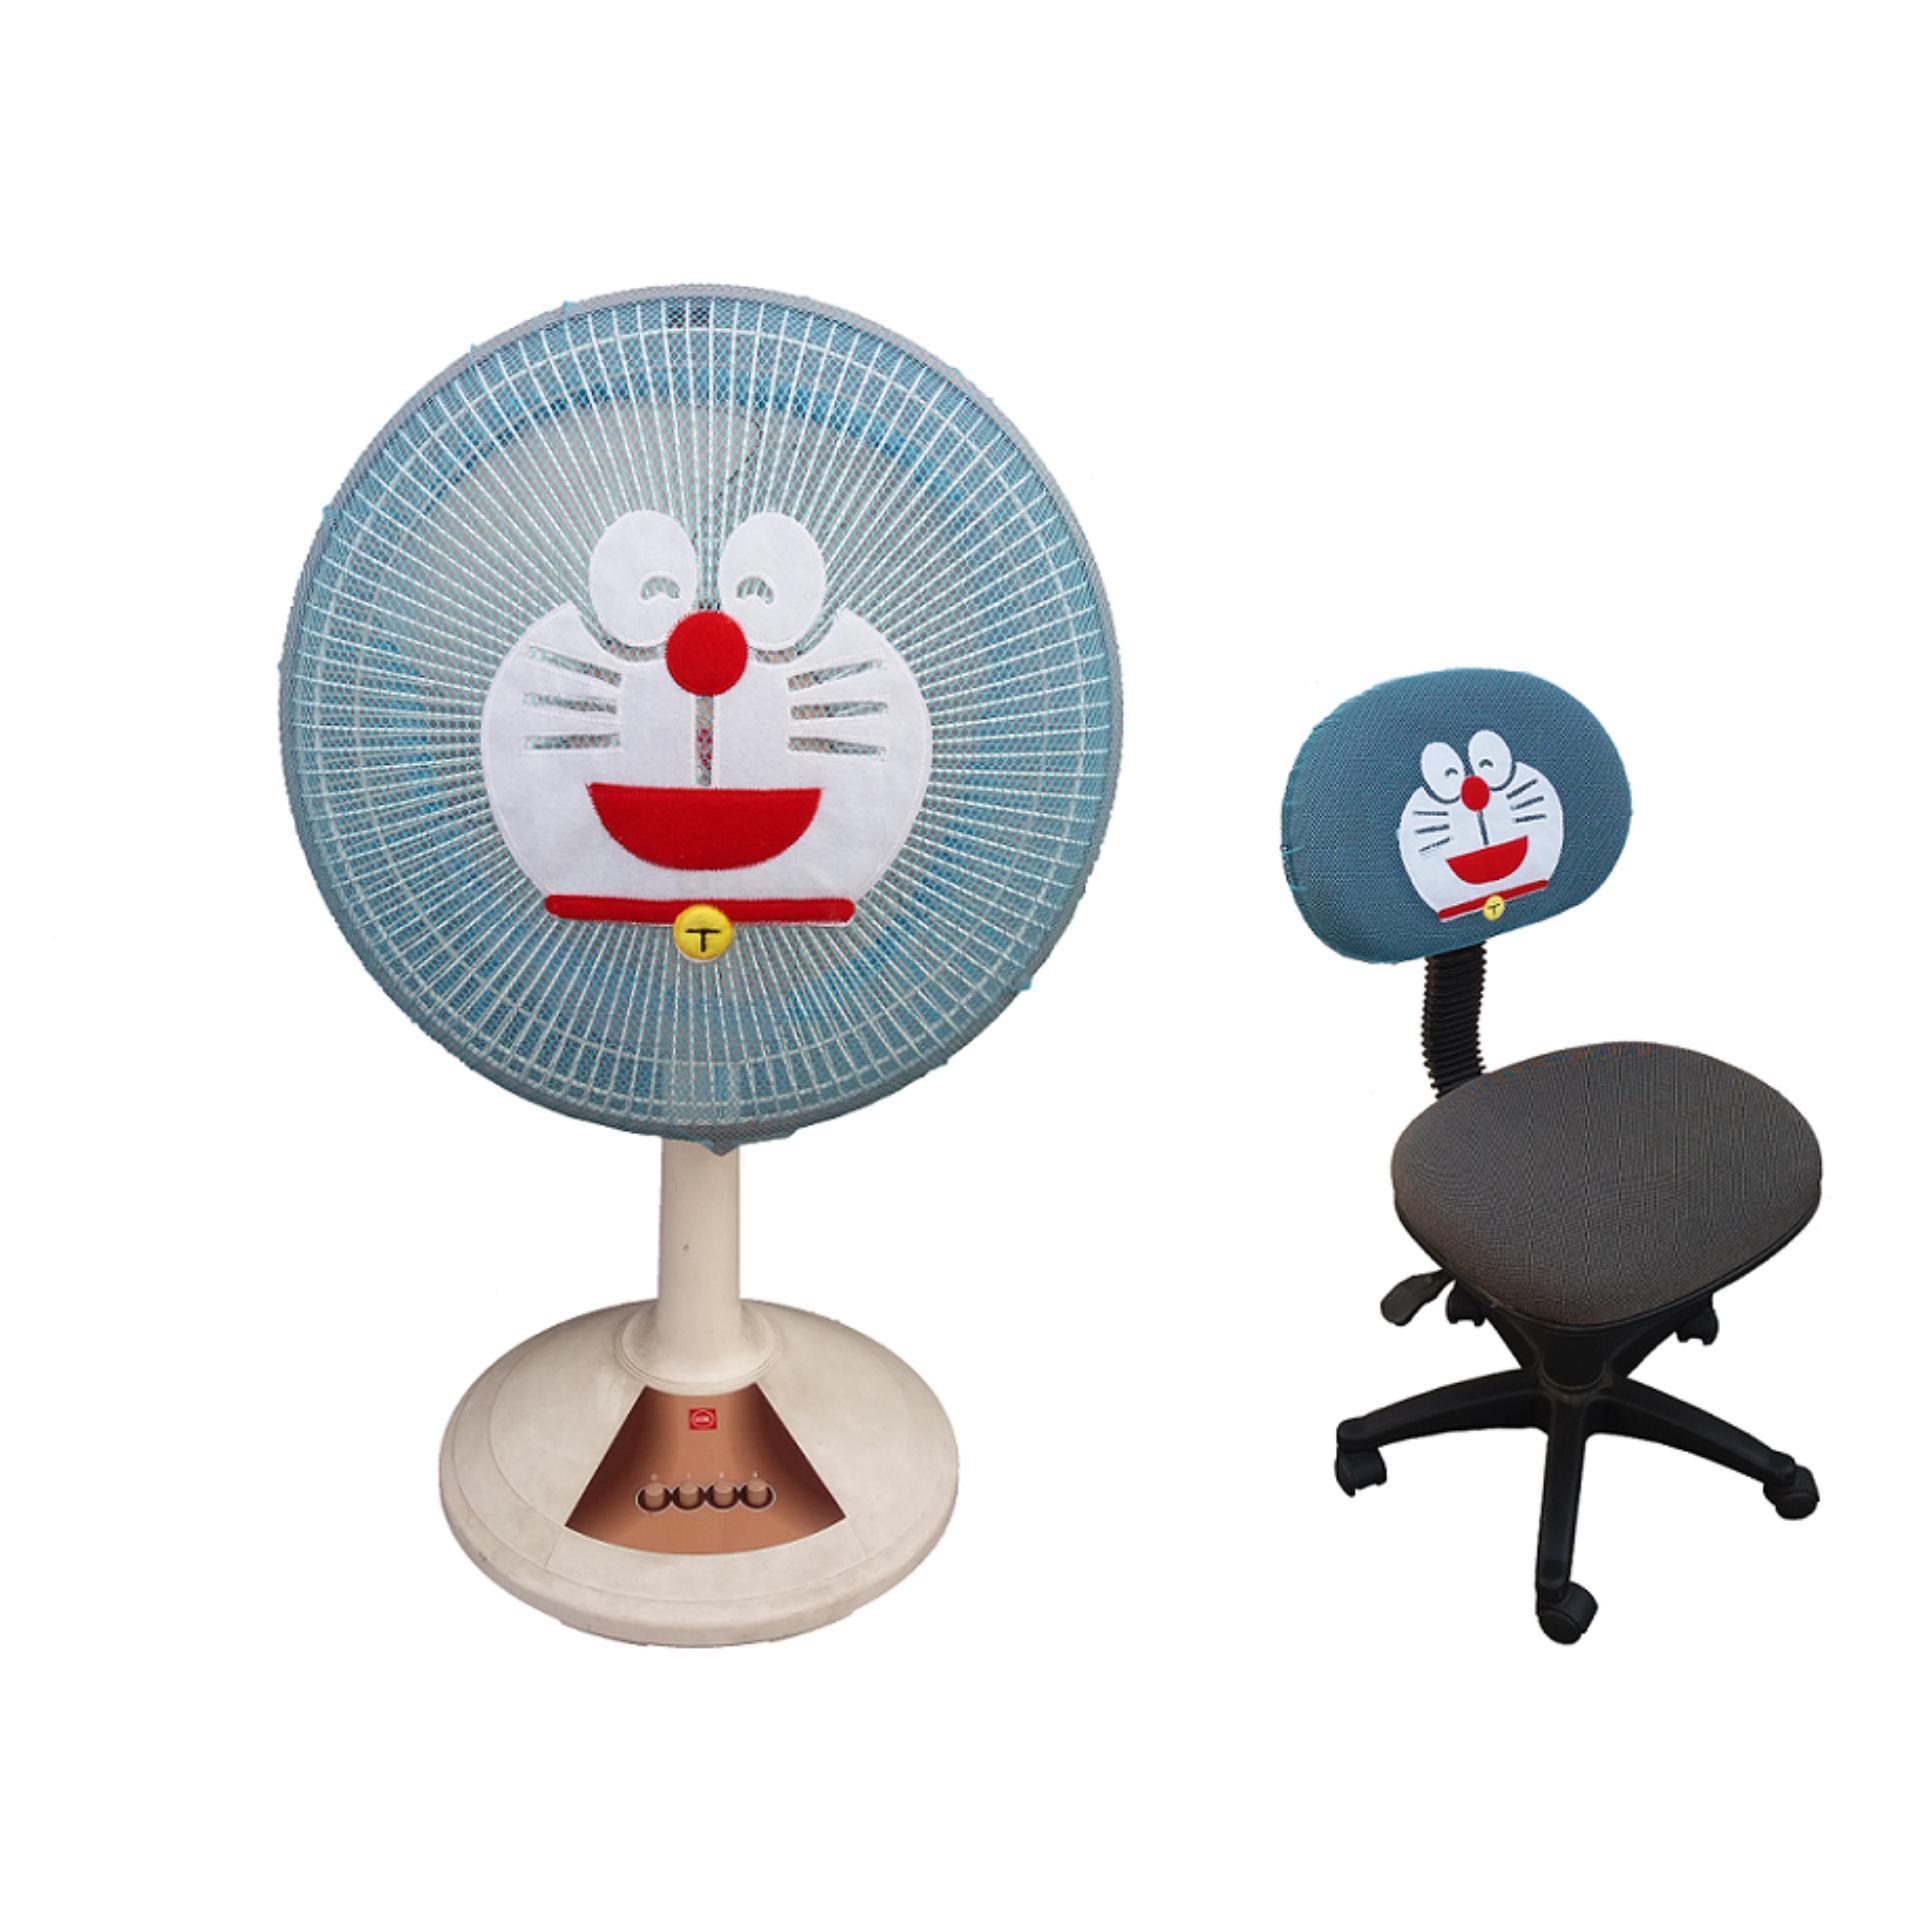 Merchandise Doraemon Terlengkap Rkb Tegal Sarung Bantal Flanel Karakter Kipas Angin Bordir